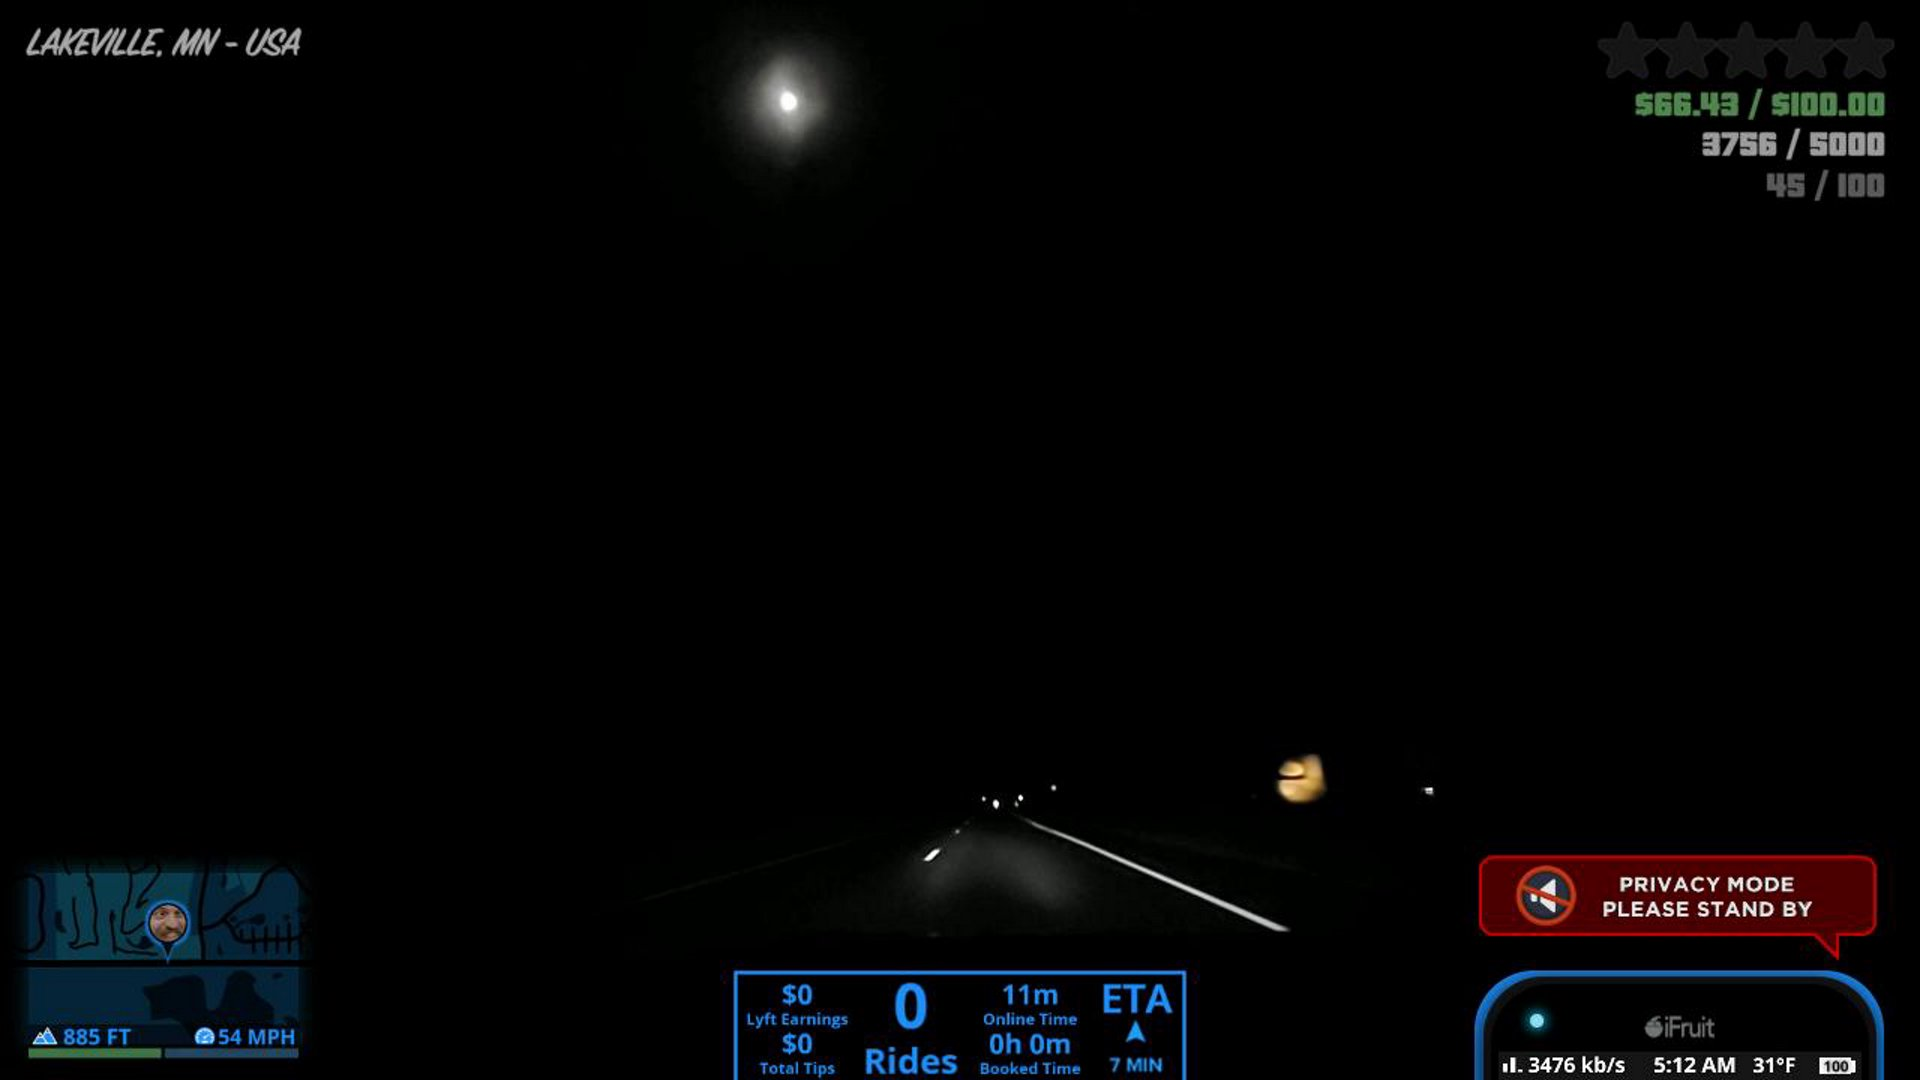 nightowls-unite-mn-usa-help-tags-lyft-uber-grab-travel-outdoors-0259-https-t-co-898bvfkuse-https-t-co-lg42bzkwpc